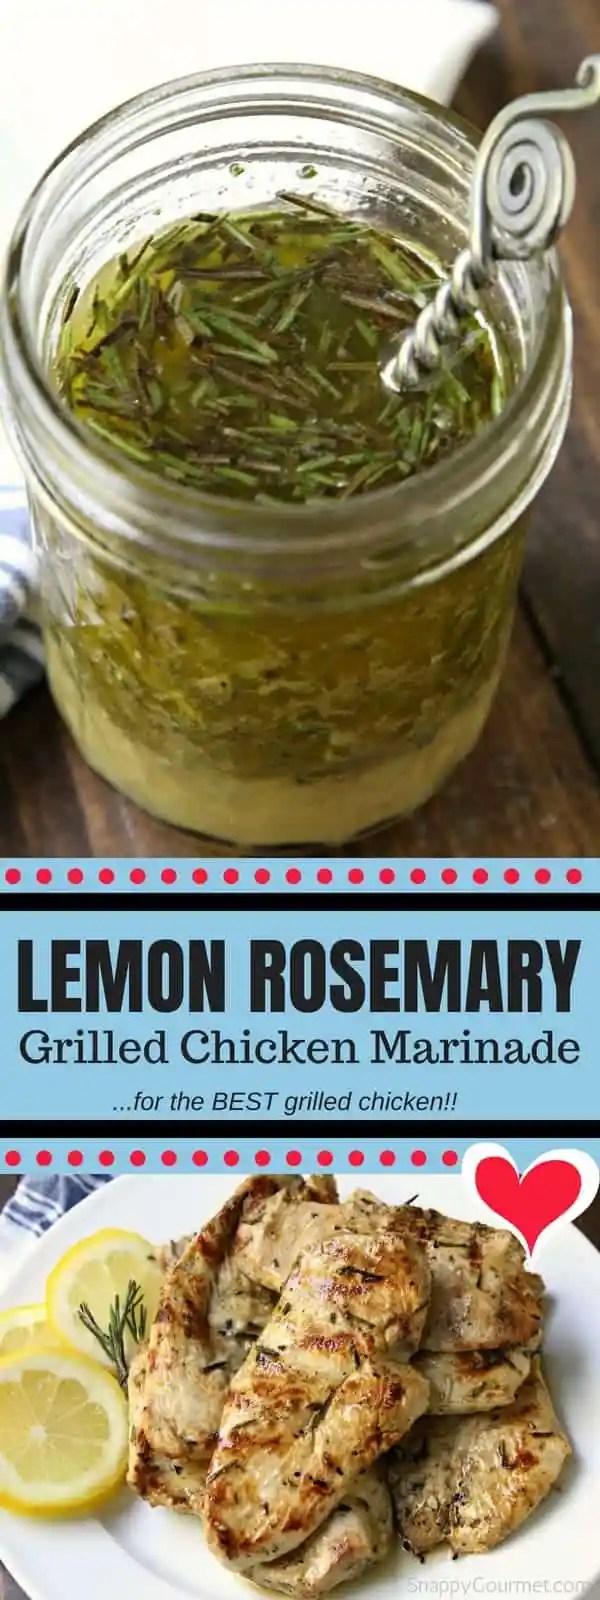 Lemon Rosemary Grilled Chicken Marinade - easy homemade marinade for the best grilled chicken!